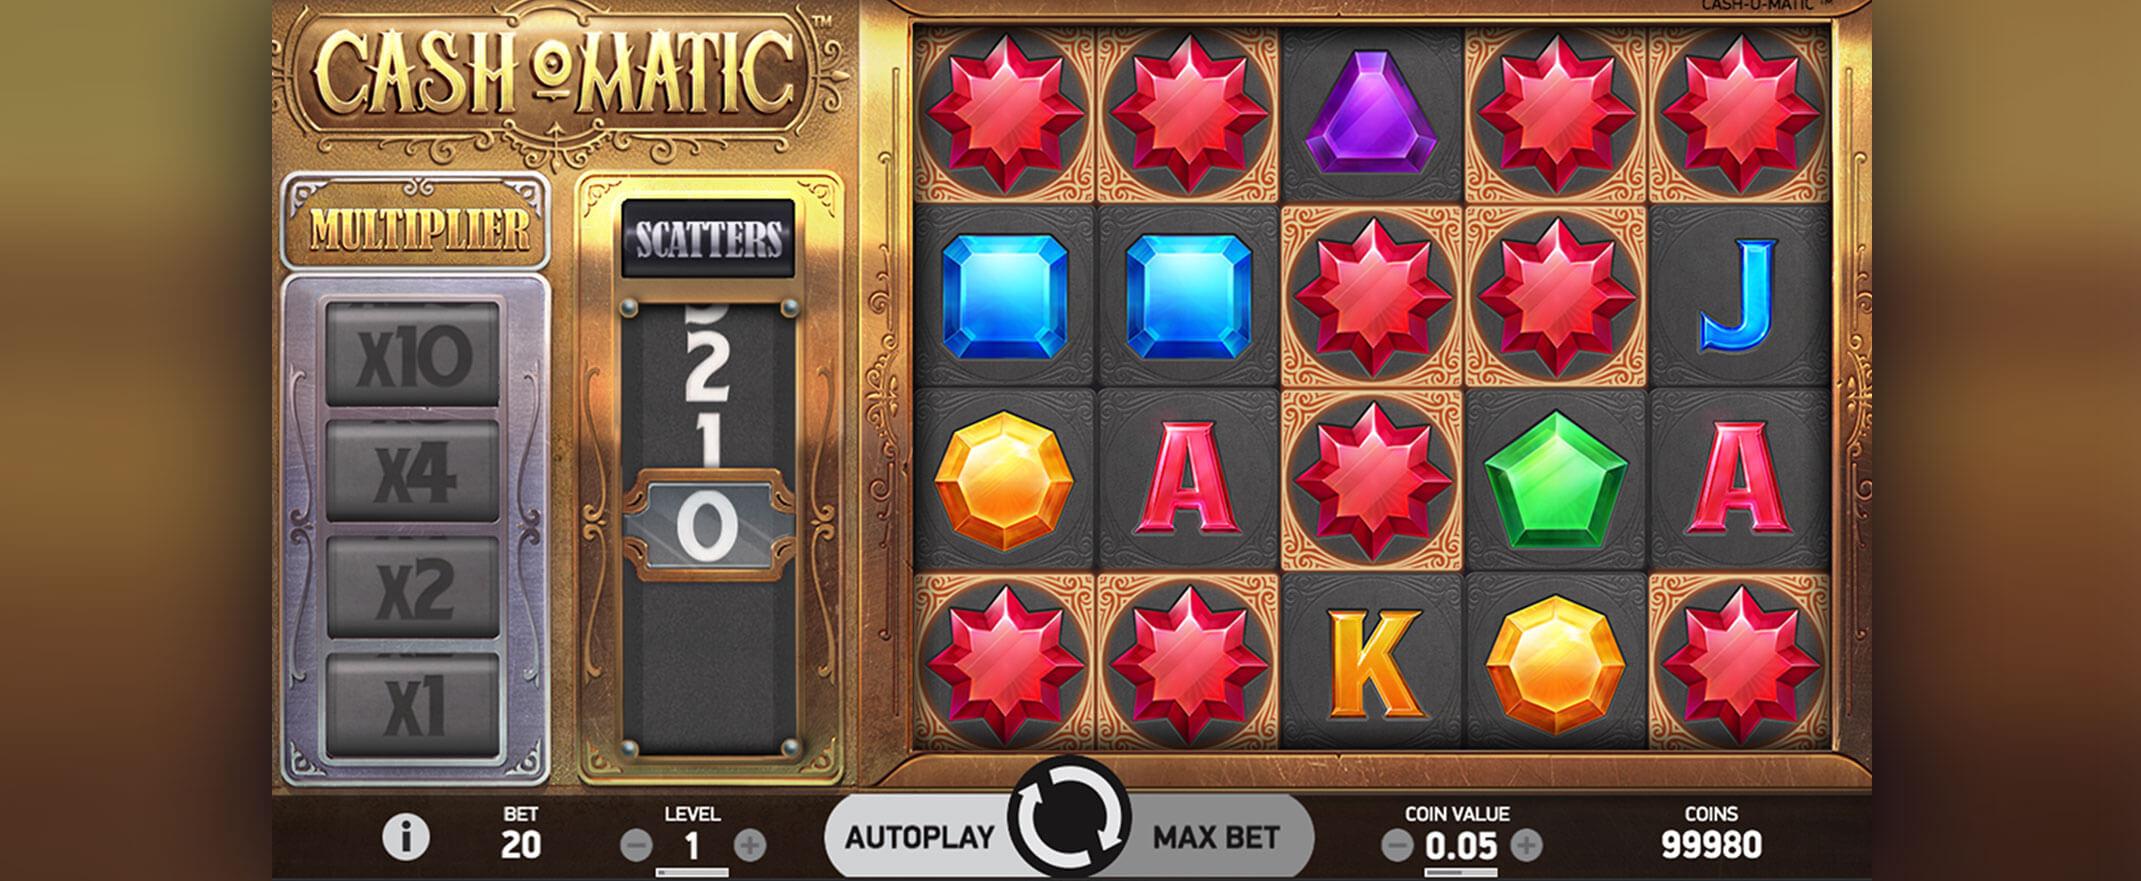 Cash-o-Matic Slot Gameplay